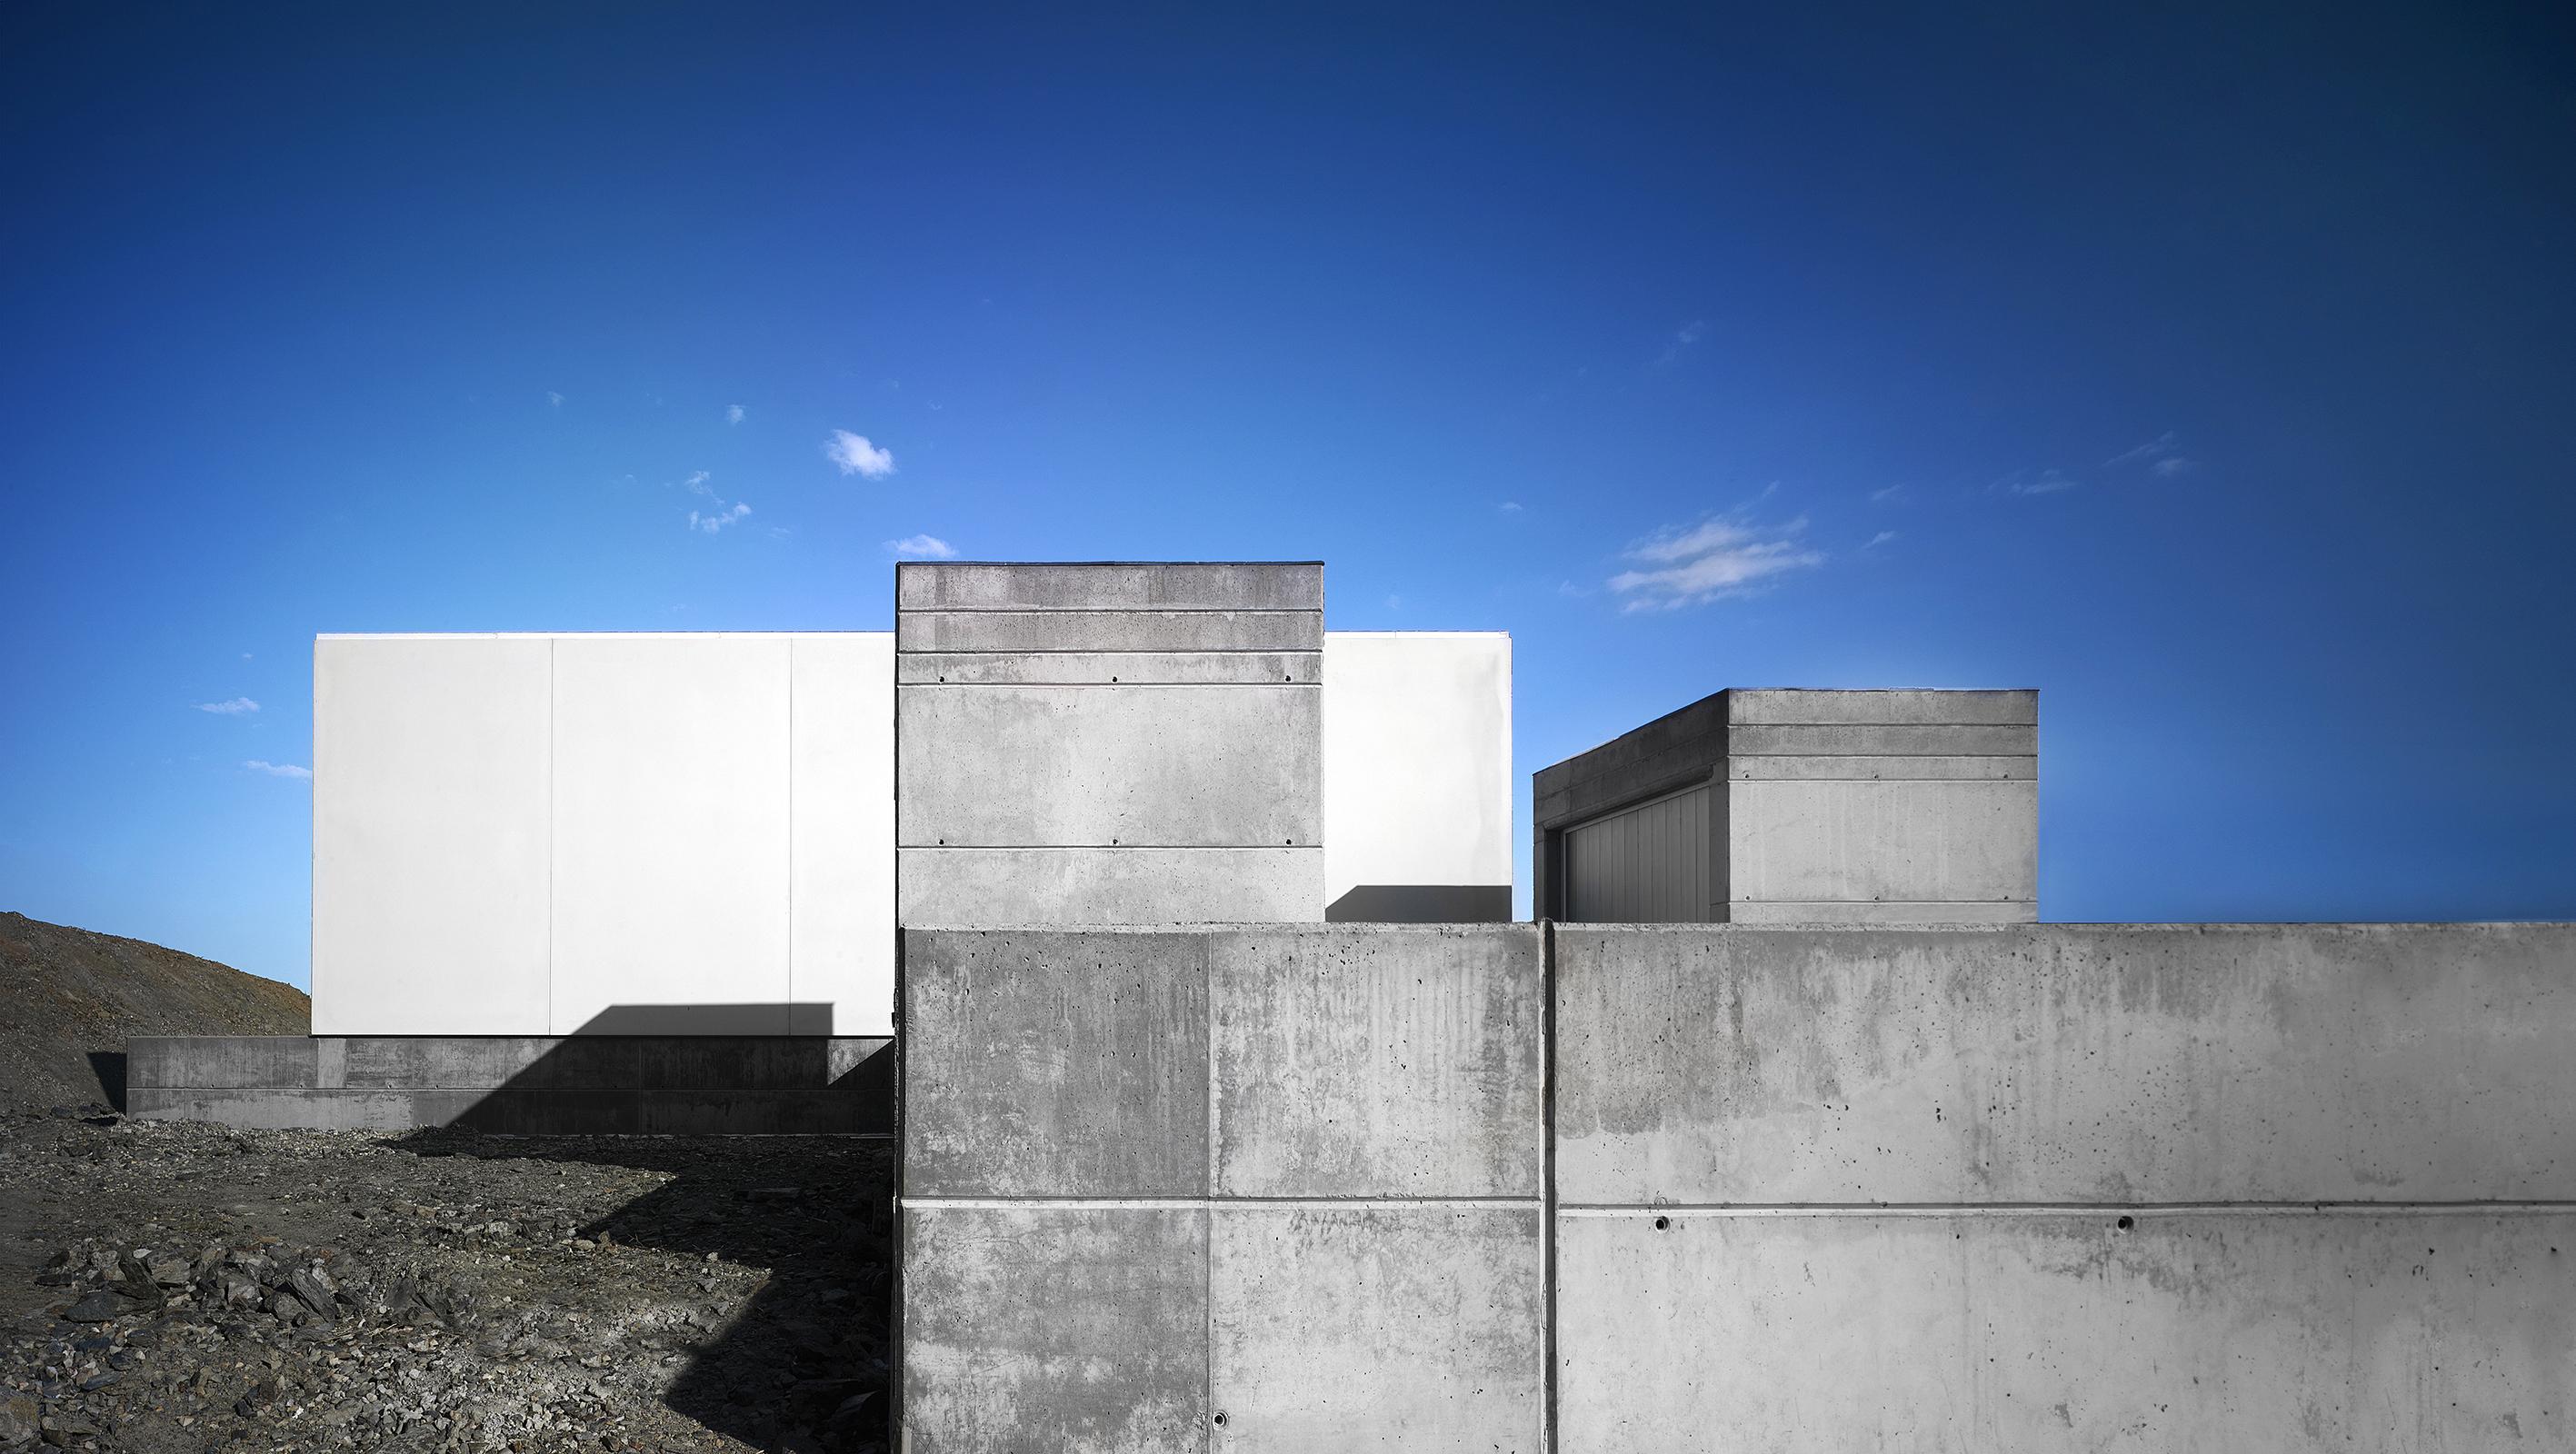 Pabellón Gimnasia Malpartida de Plasencia - LANDINEZ+REY | equipo L2G arquitectos, [eL2Gaa]